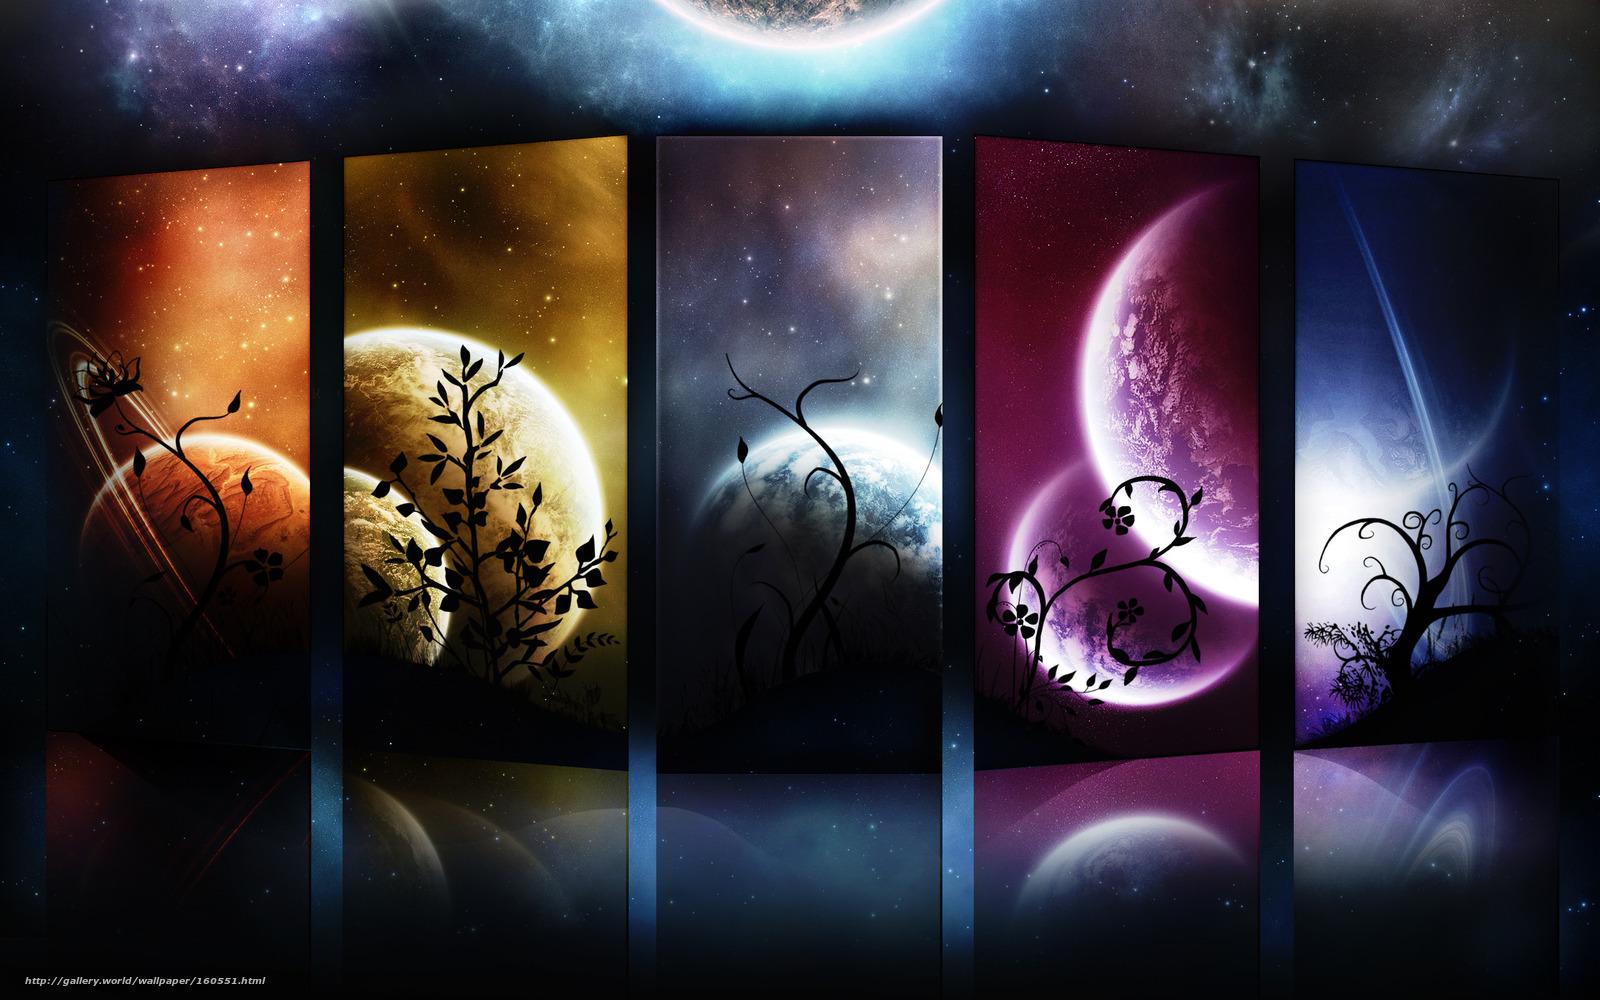 Amazoncom Galaxy wallpaper